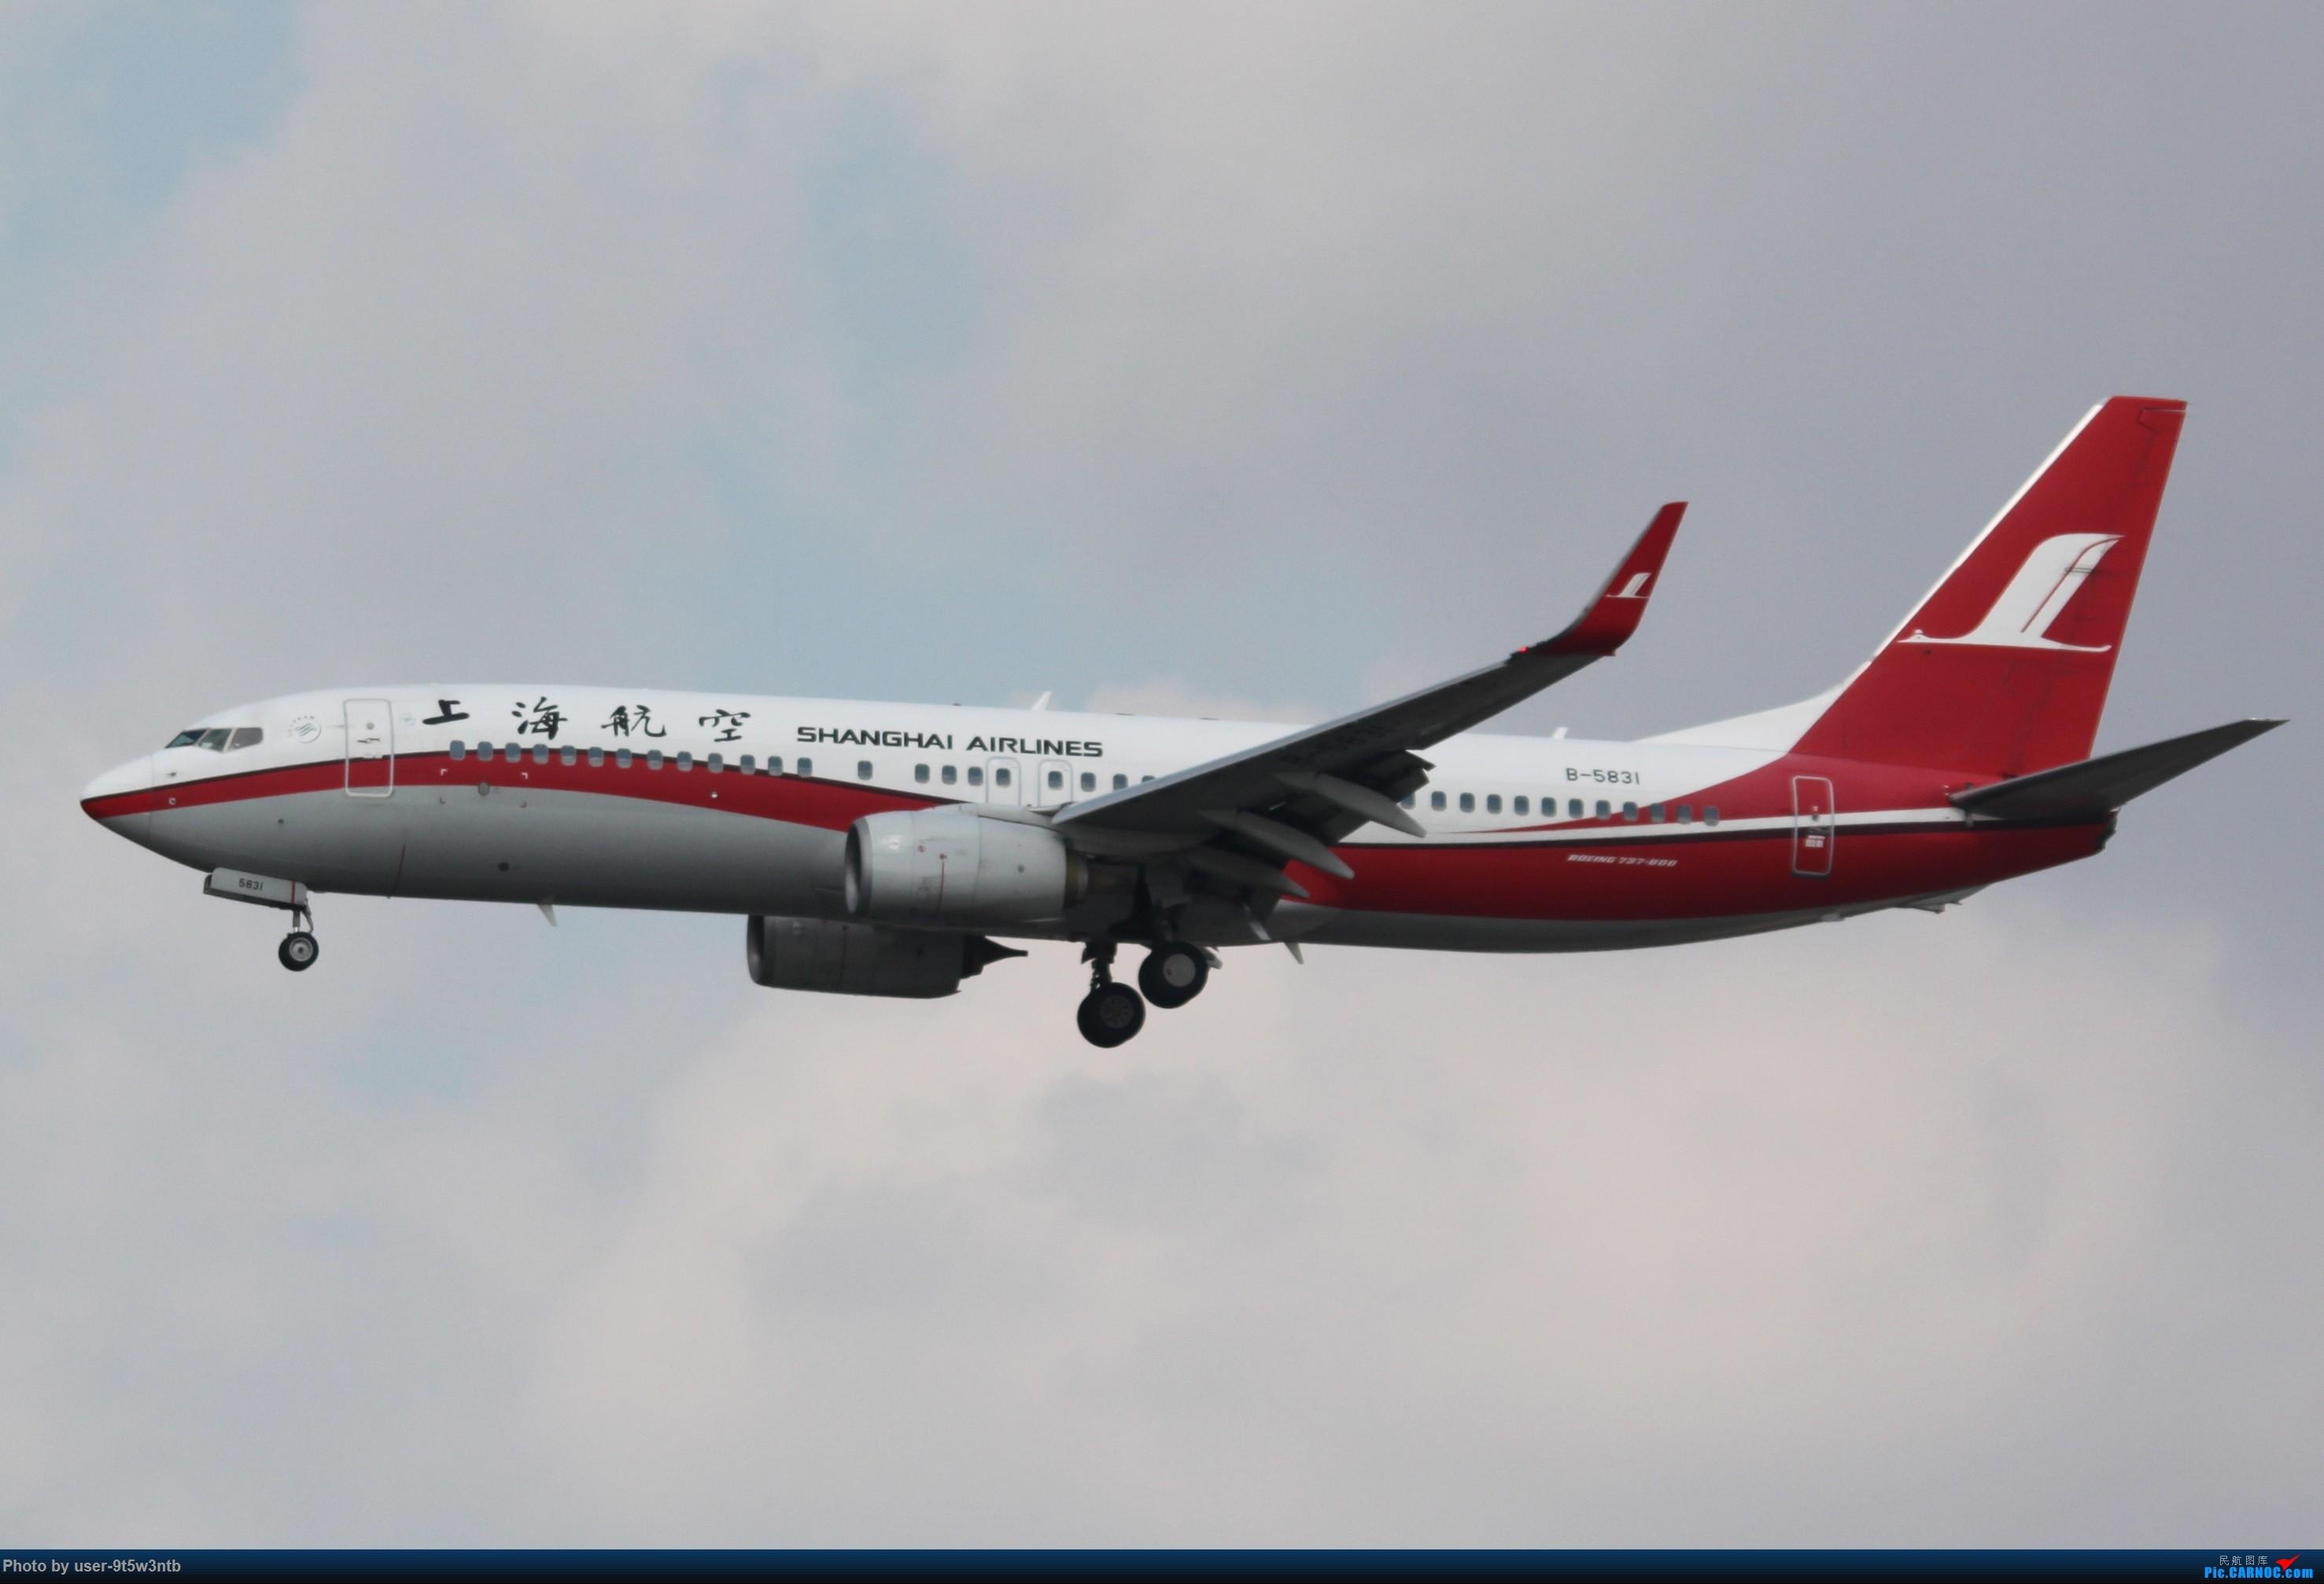 Re:[原创]虹桥机场炎热的早晨 BOEING 737-800 B-5831 中国上海虹桥国际机场